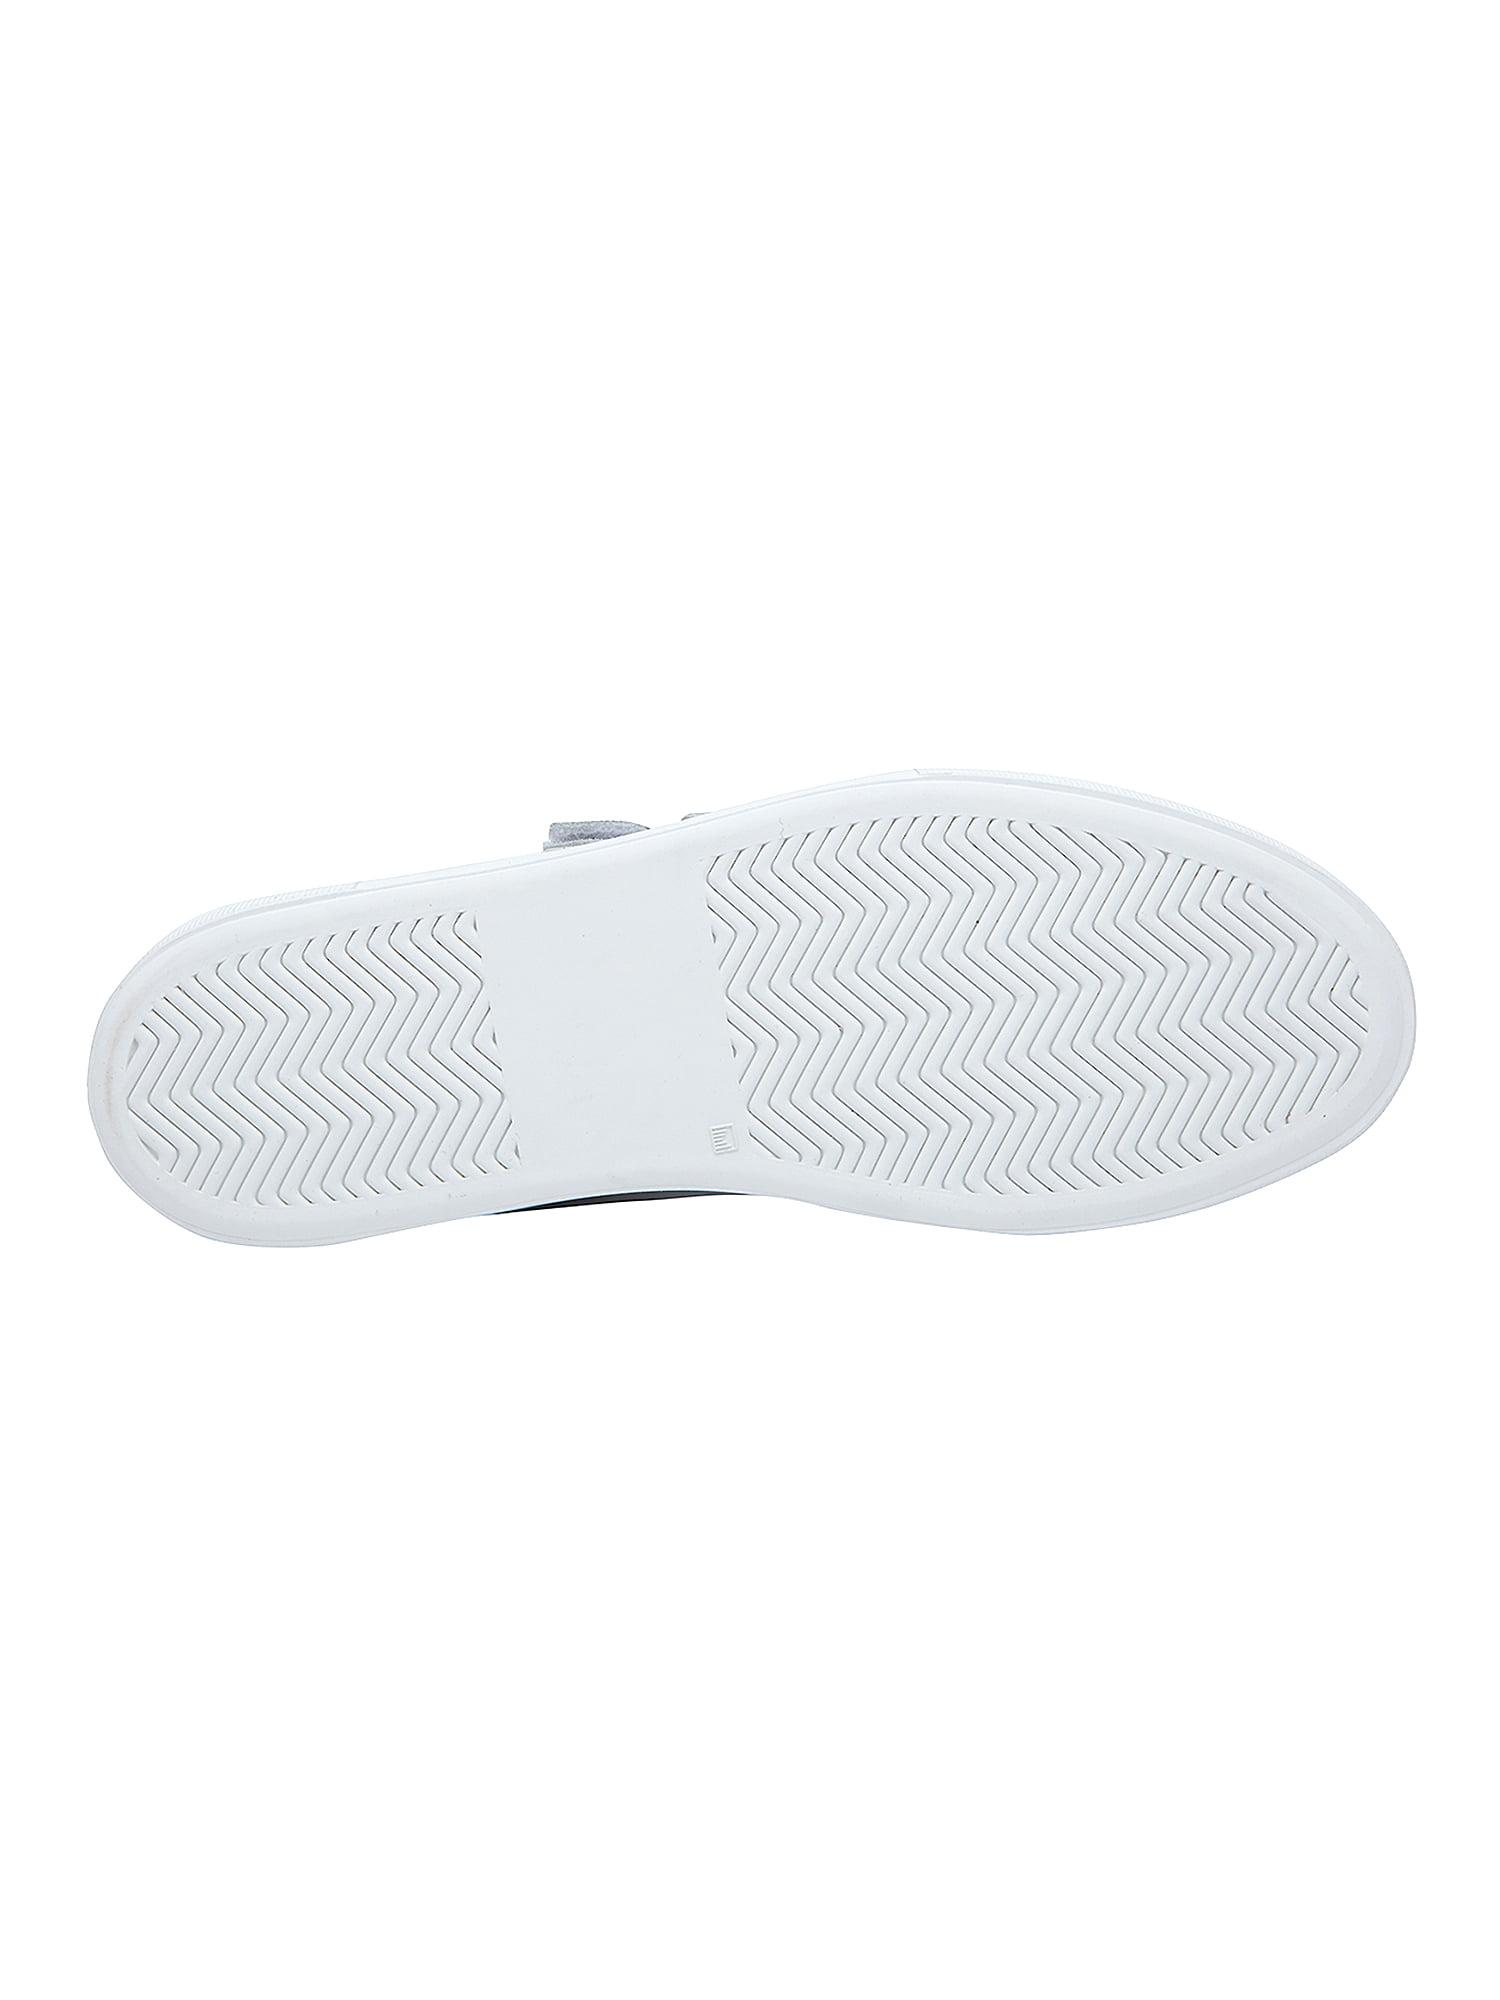 AMI Men's 3 Strap Sneakers H16S17.90 White